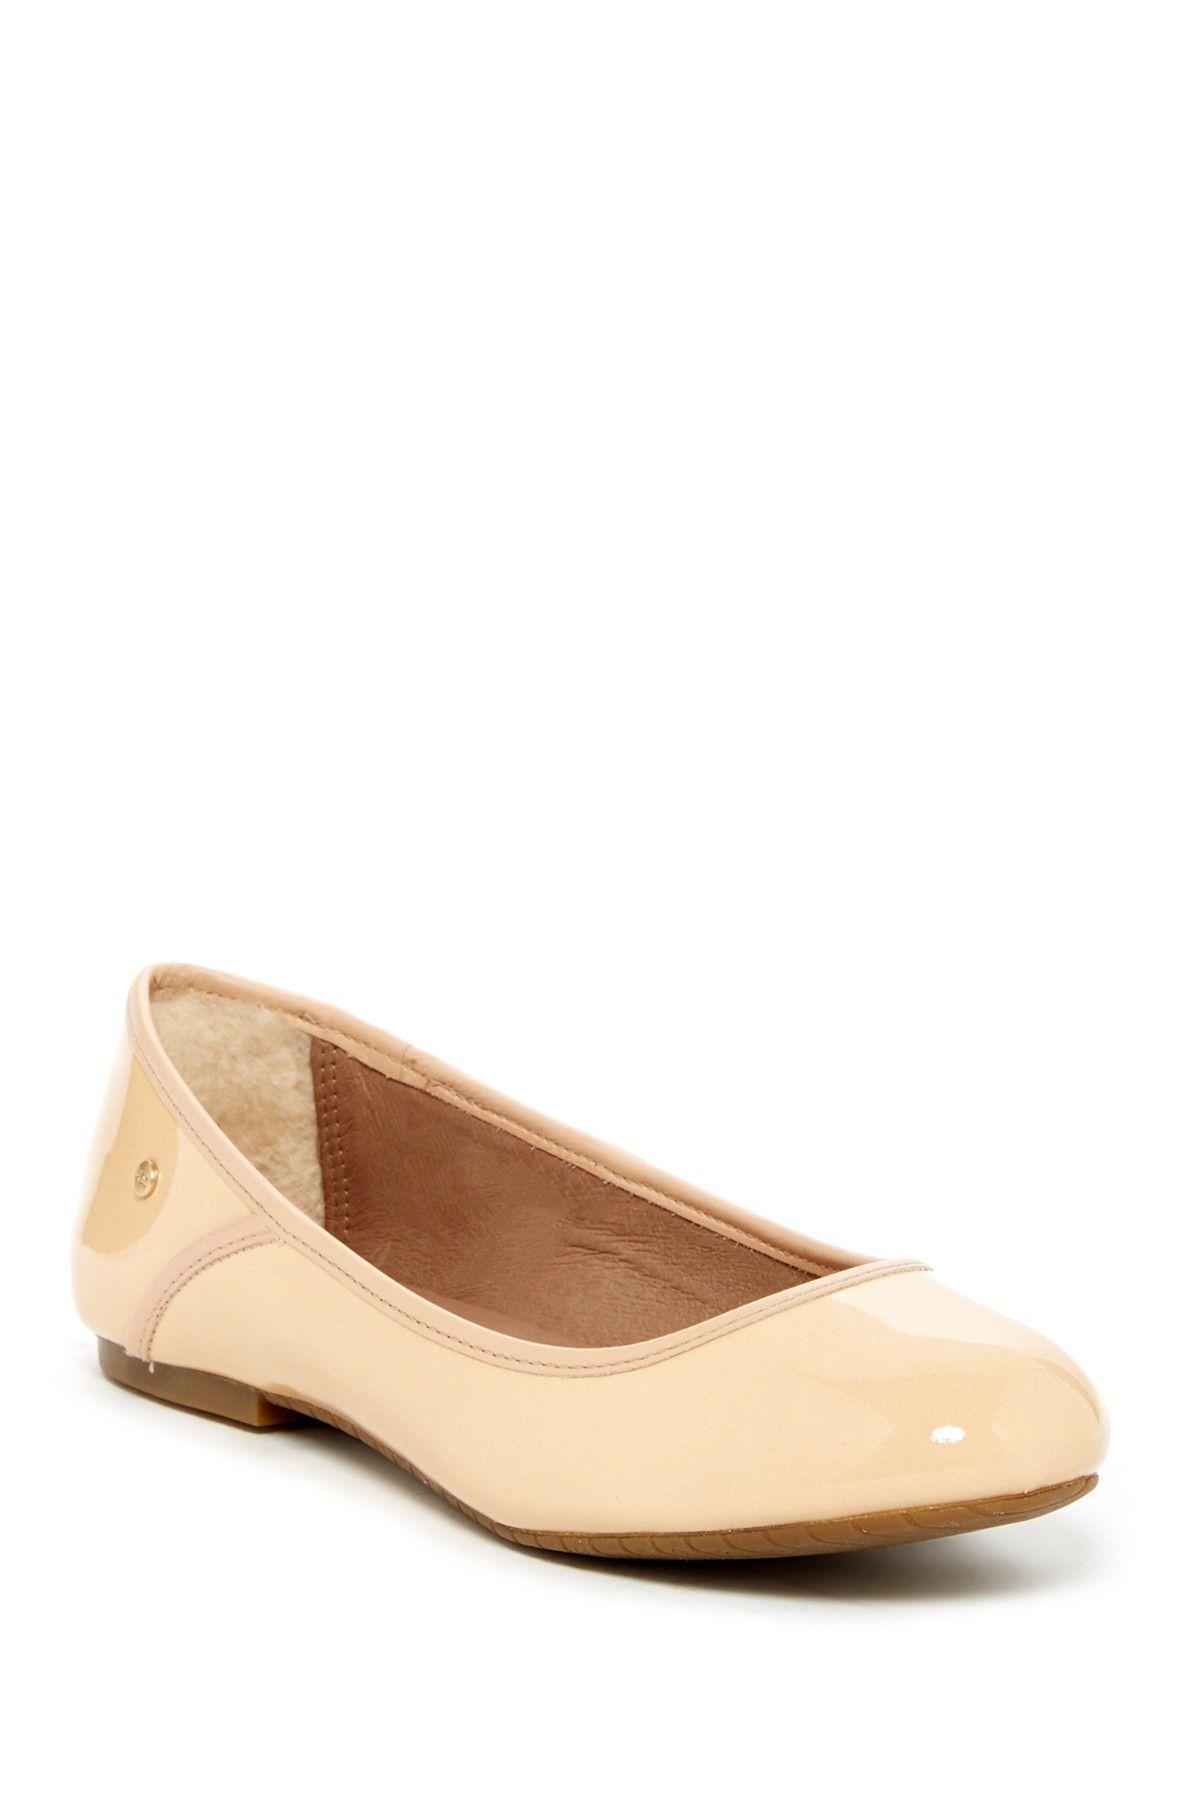 Chaussures - Ballerines Ugg Vente Bon Marché tQlGQRo